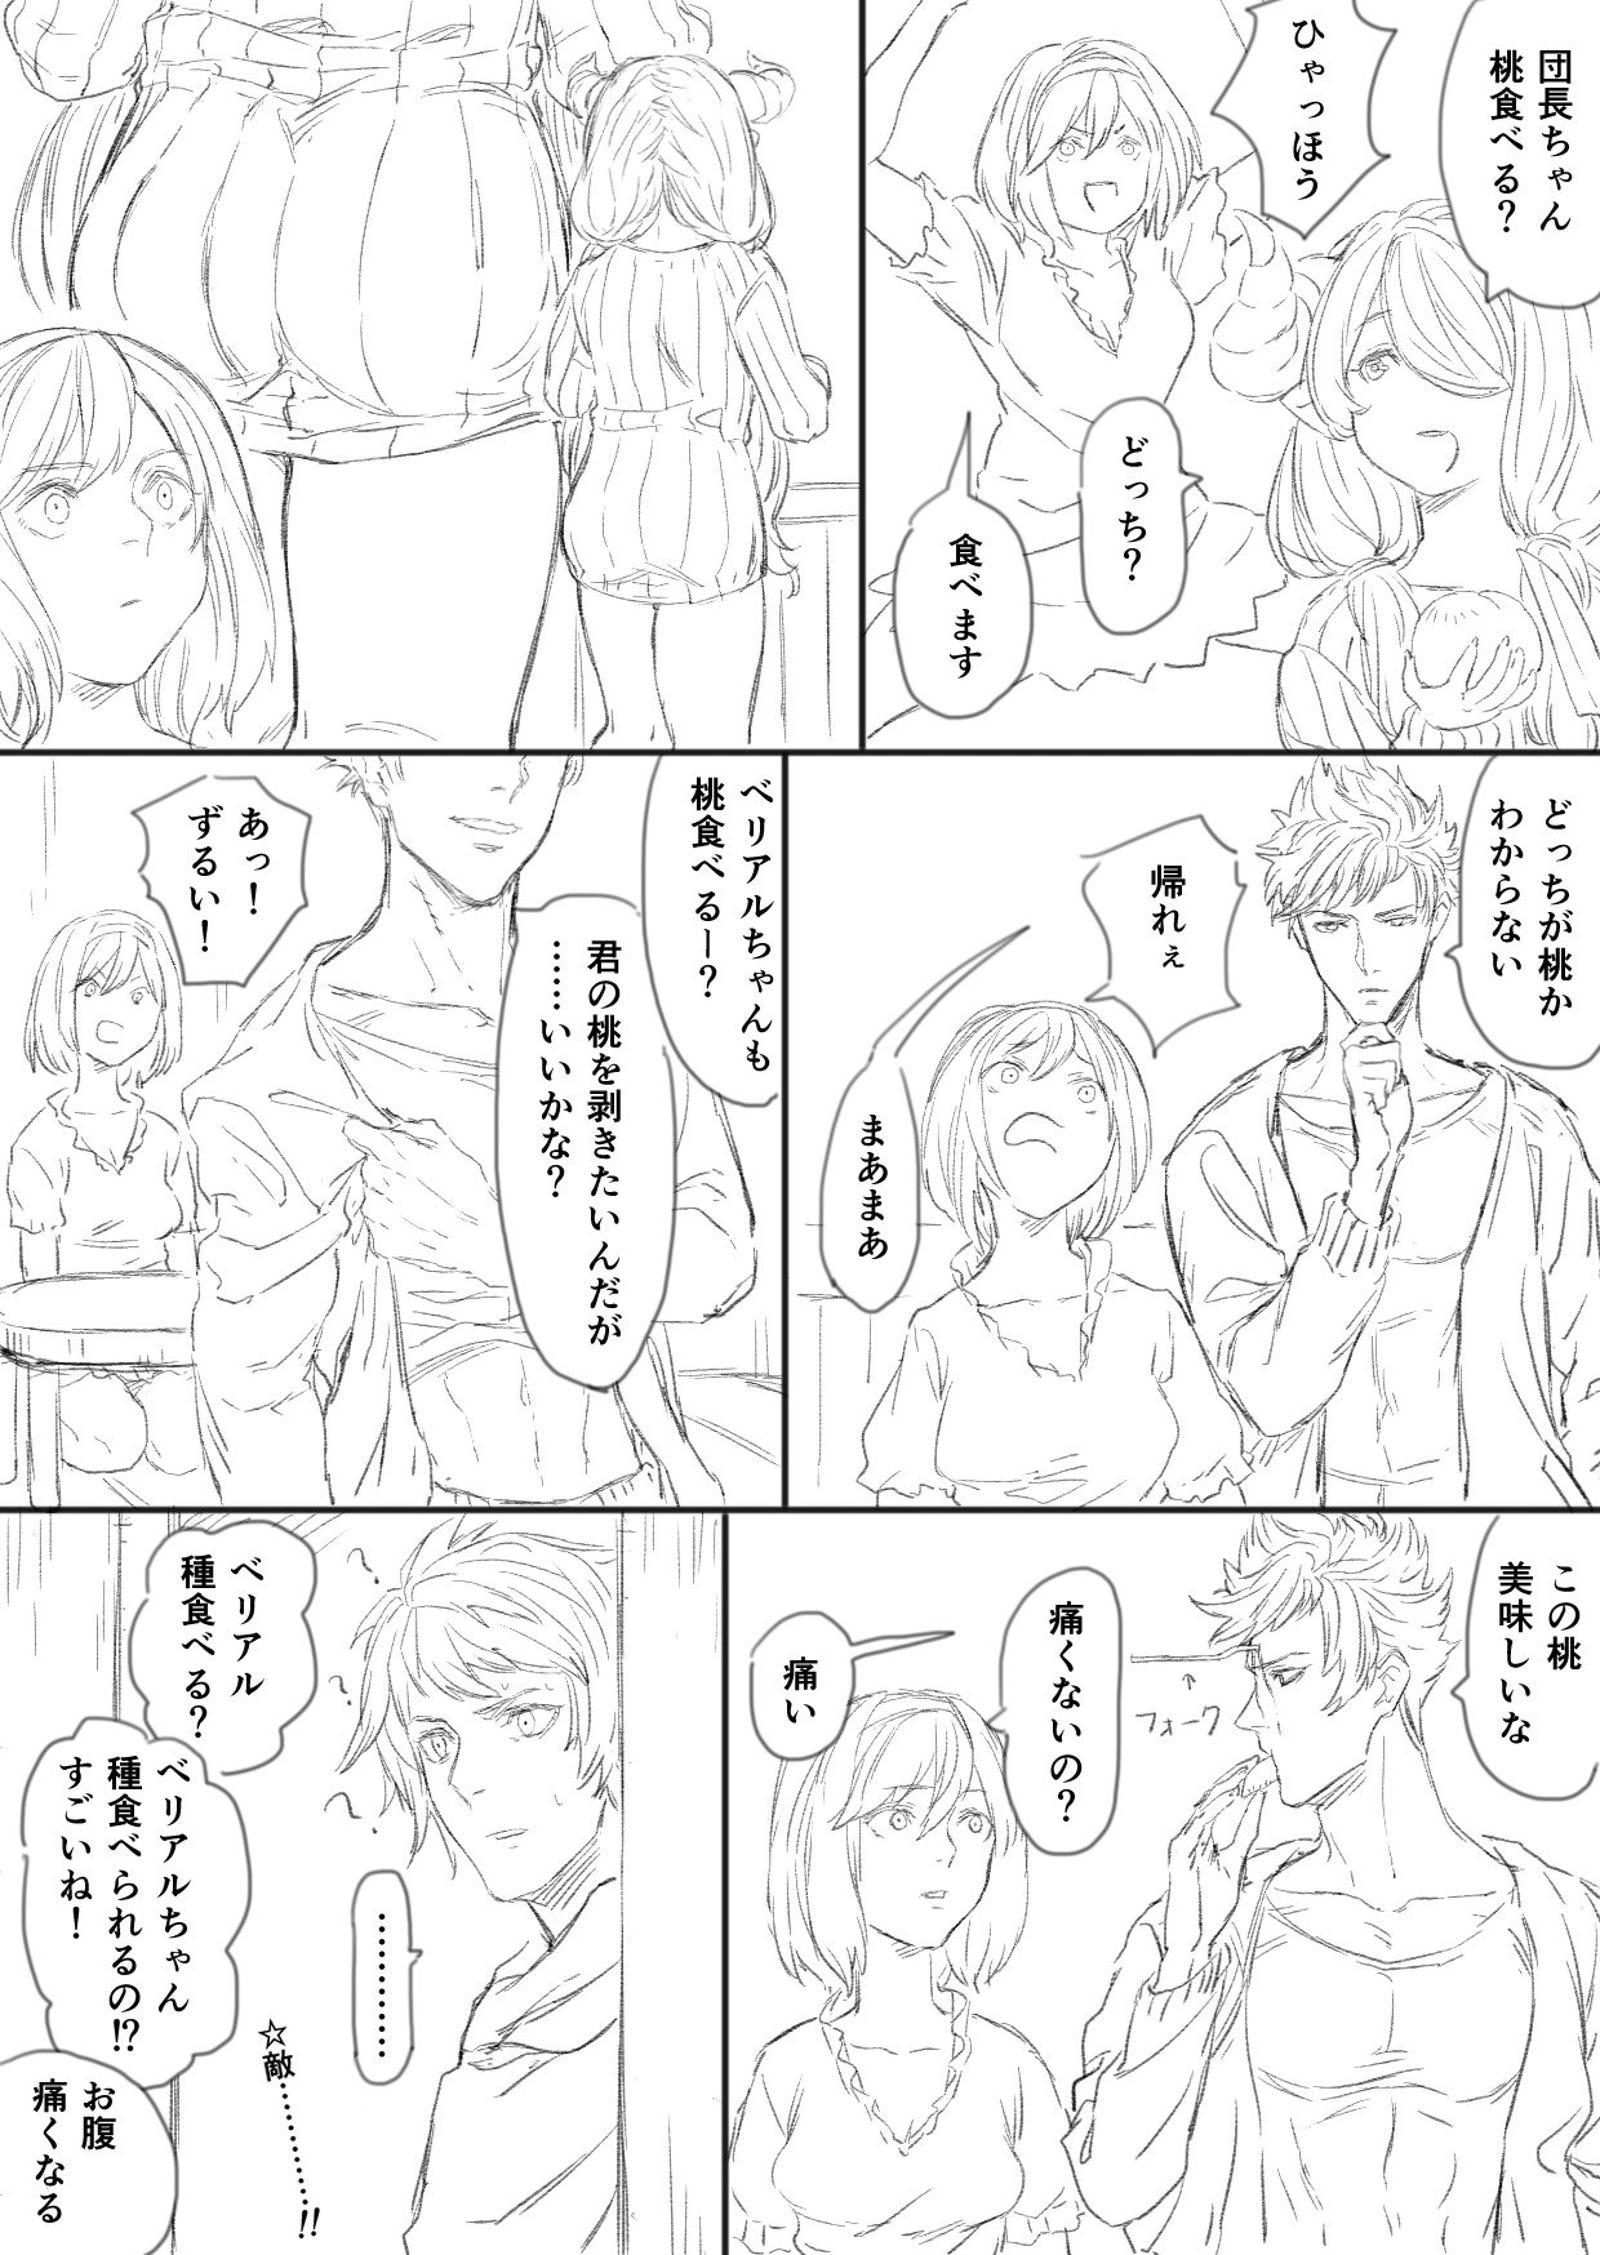 Original Japanese source.  https://twitter.com/toriudonda/status/973587363480846337